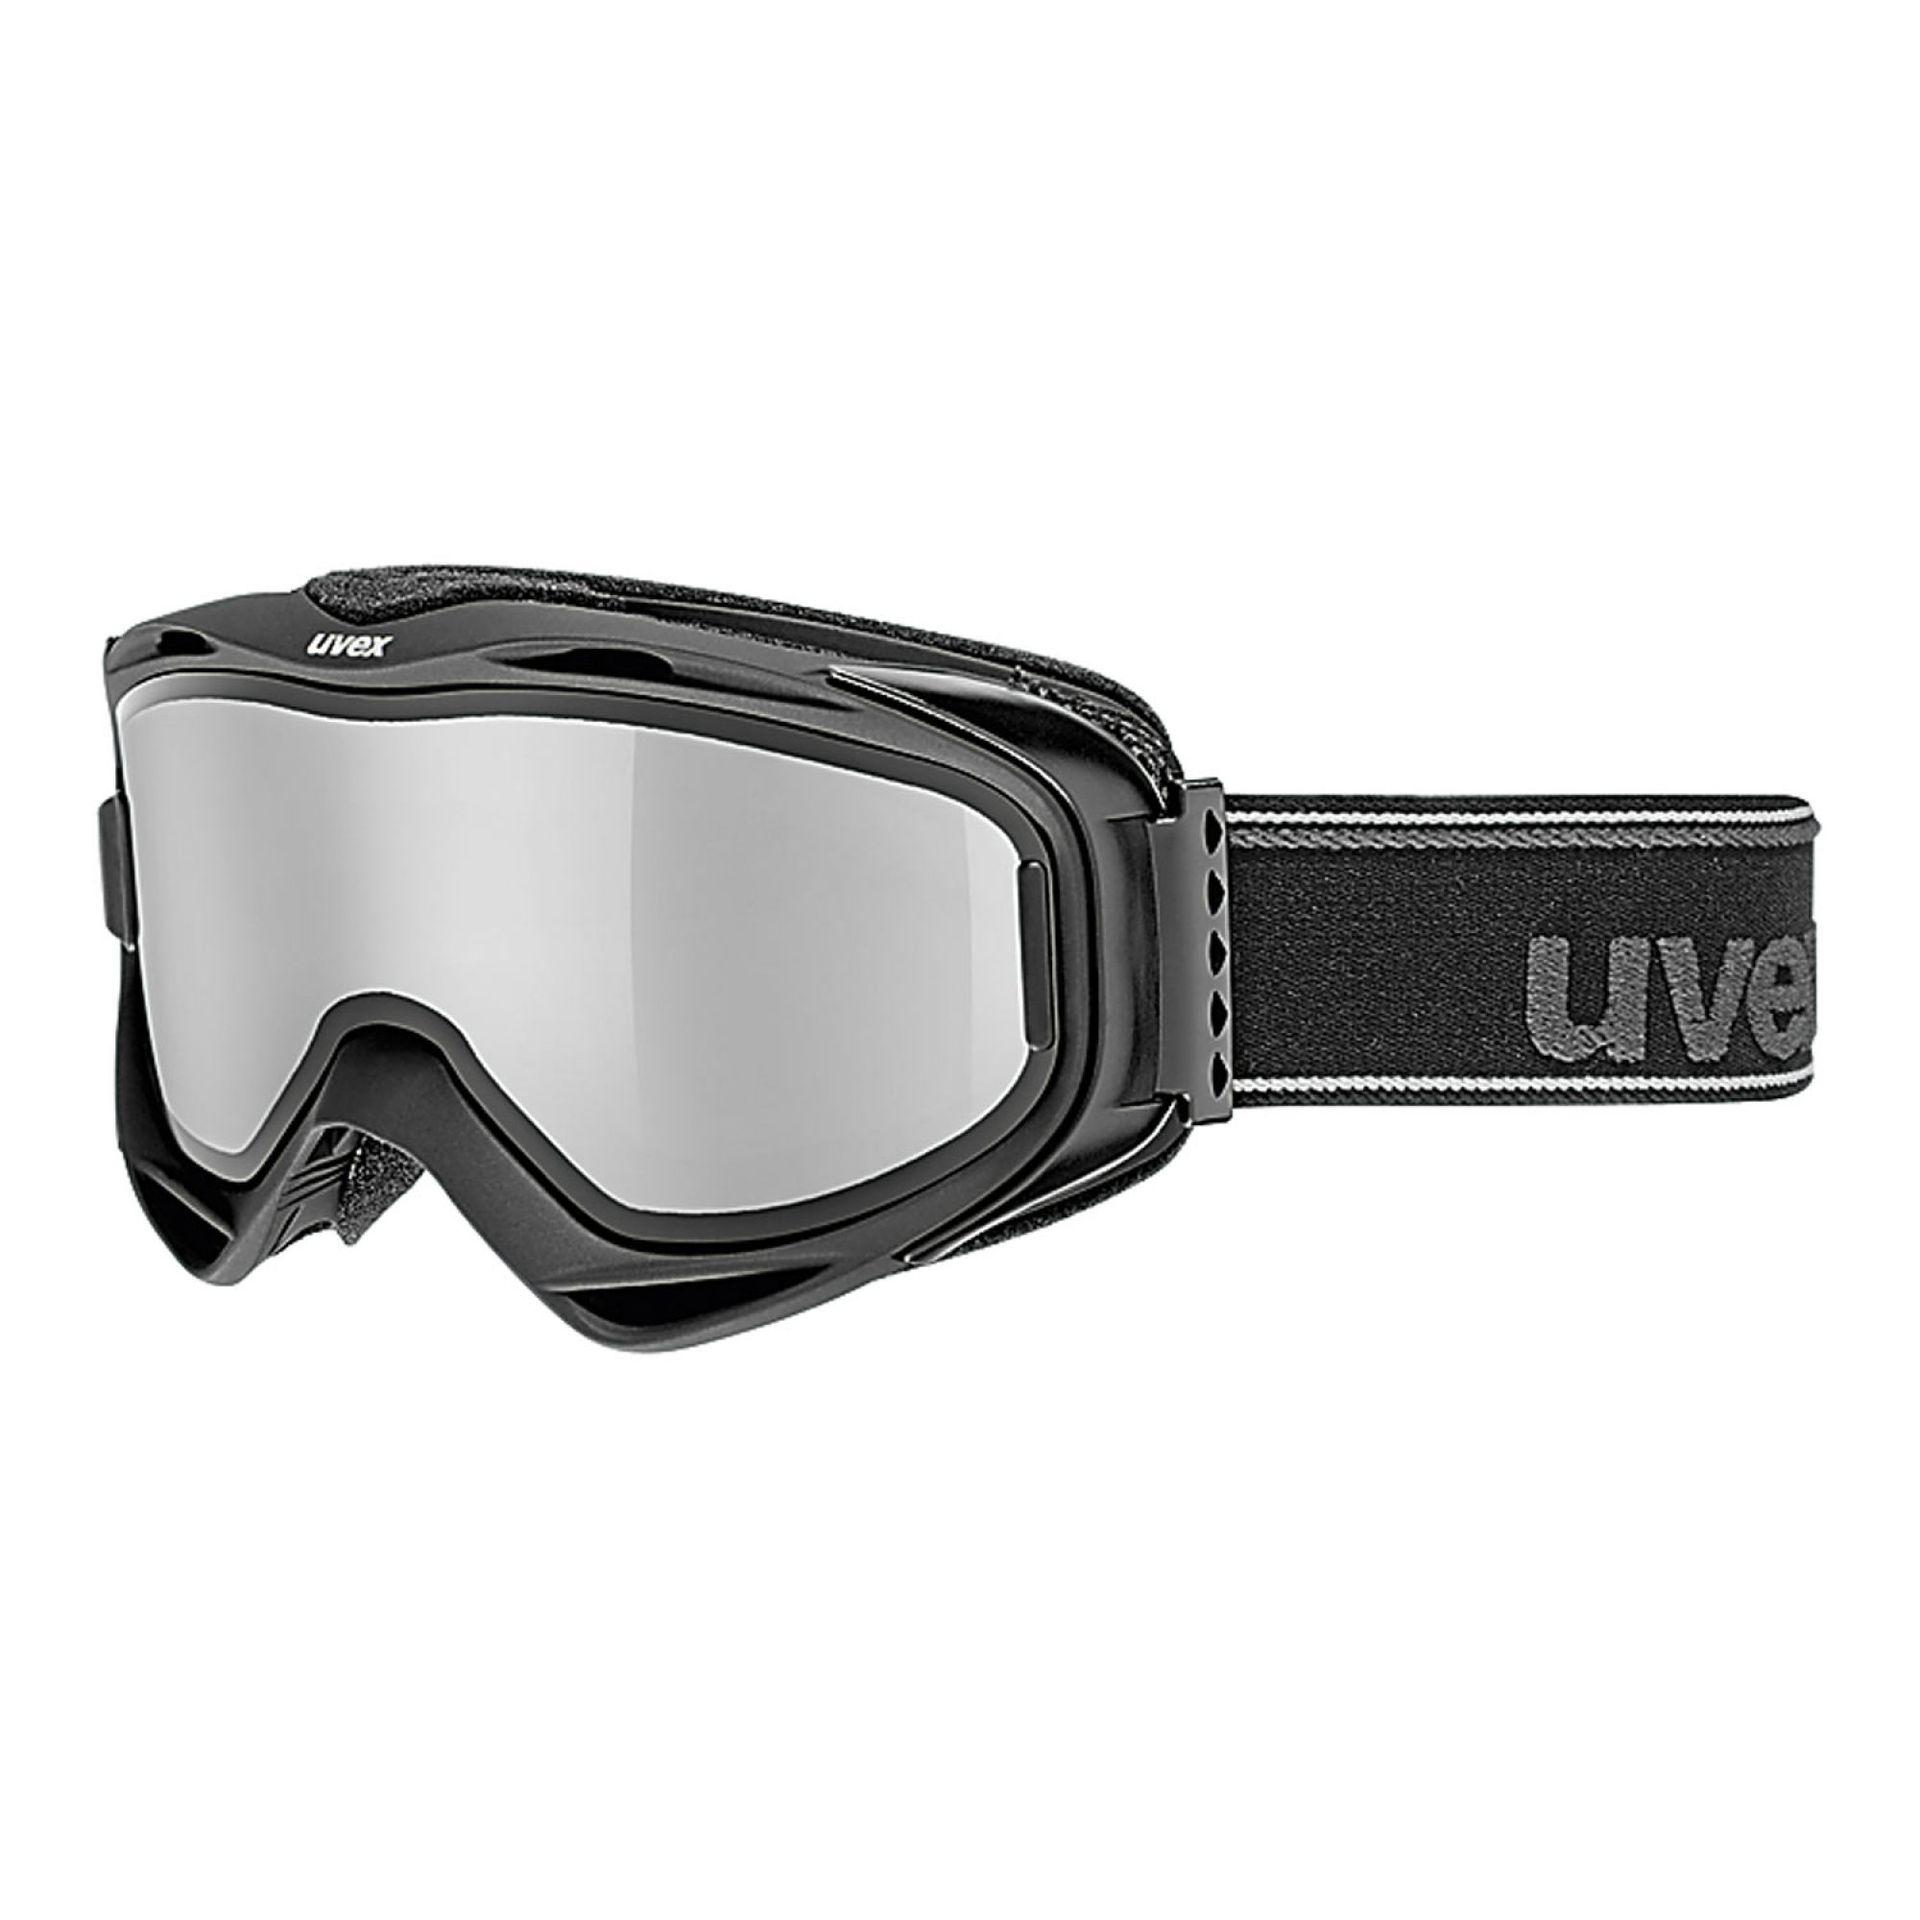 GOGLE UVEX G.GL 300 TO BLACK MAT|LASERGOLD LITE CLEAR S1